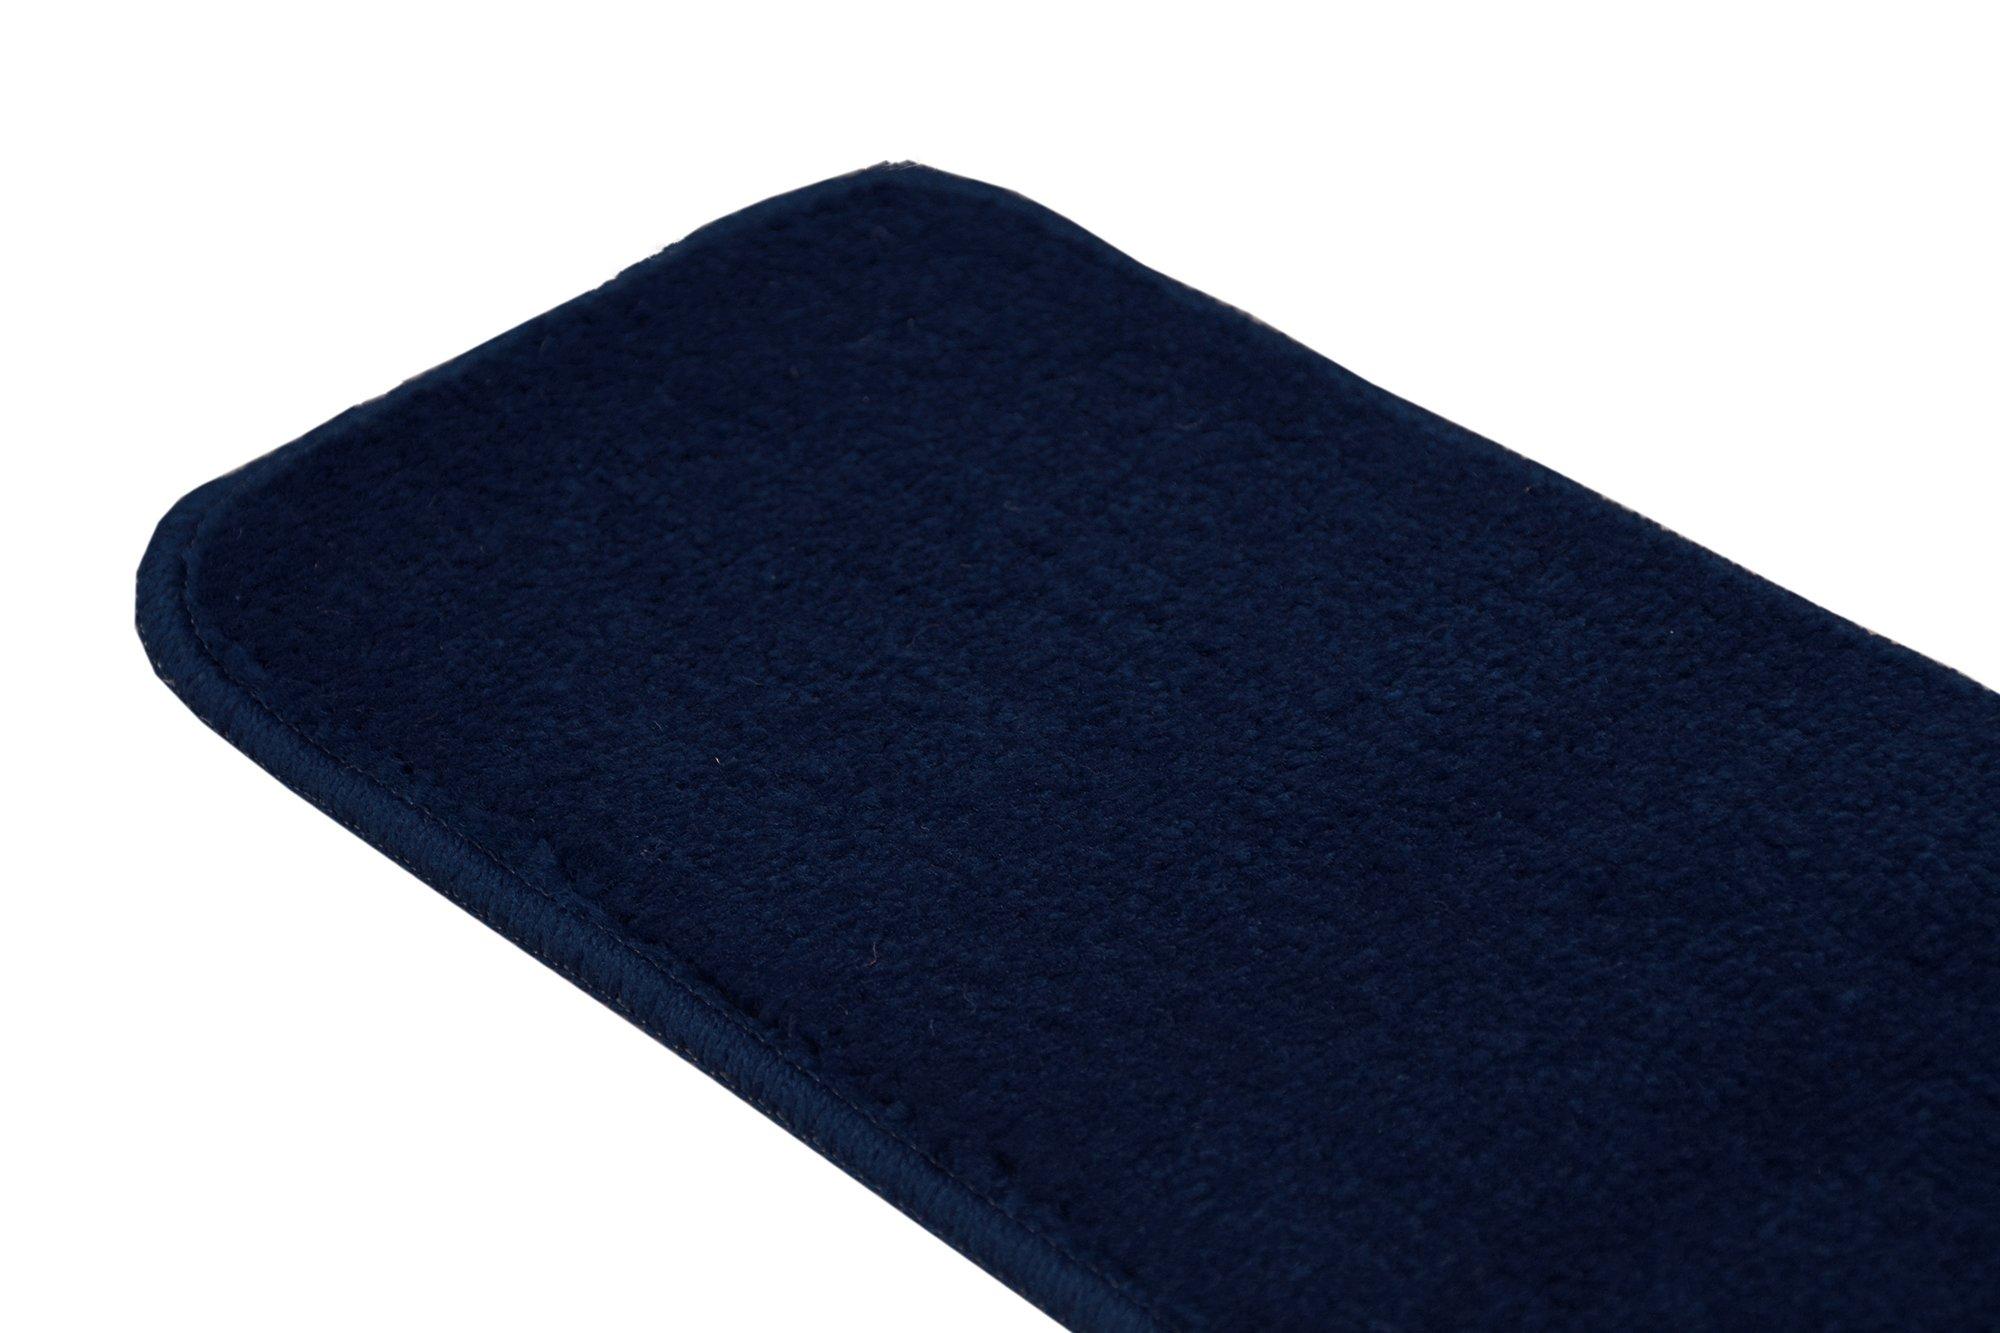 RugStylesOnline TRENDY-ST-8X30-NAVY-13 Trendy Stair Tread Treads Indoor Skid Slip Resistant Carpet Stair Tread Treads Machine Washable 8 ½'' W x 30'' L, Royal Navy Blue, Set of 13 by RugStylesOnline (Image #7)